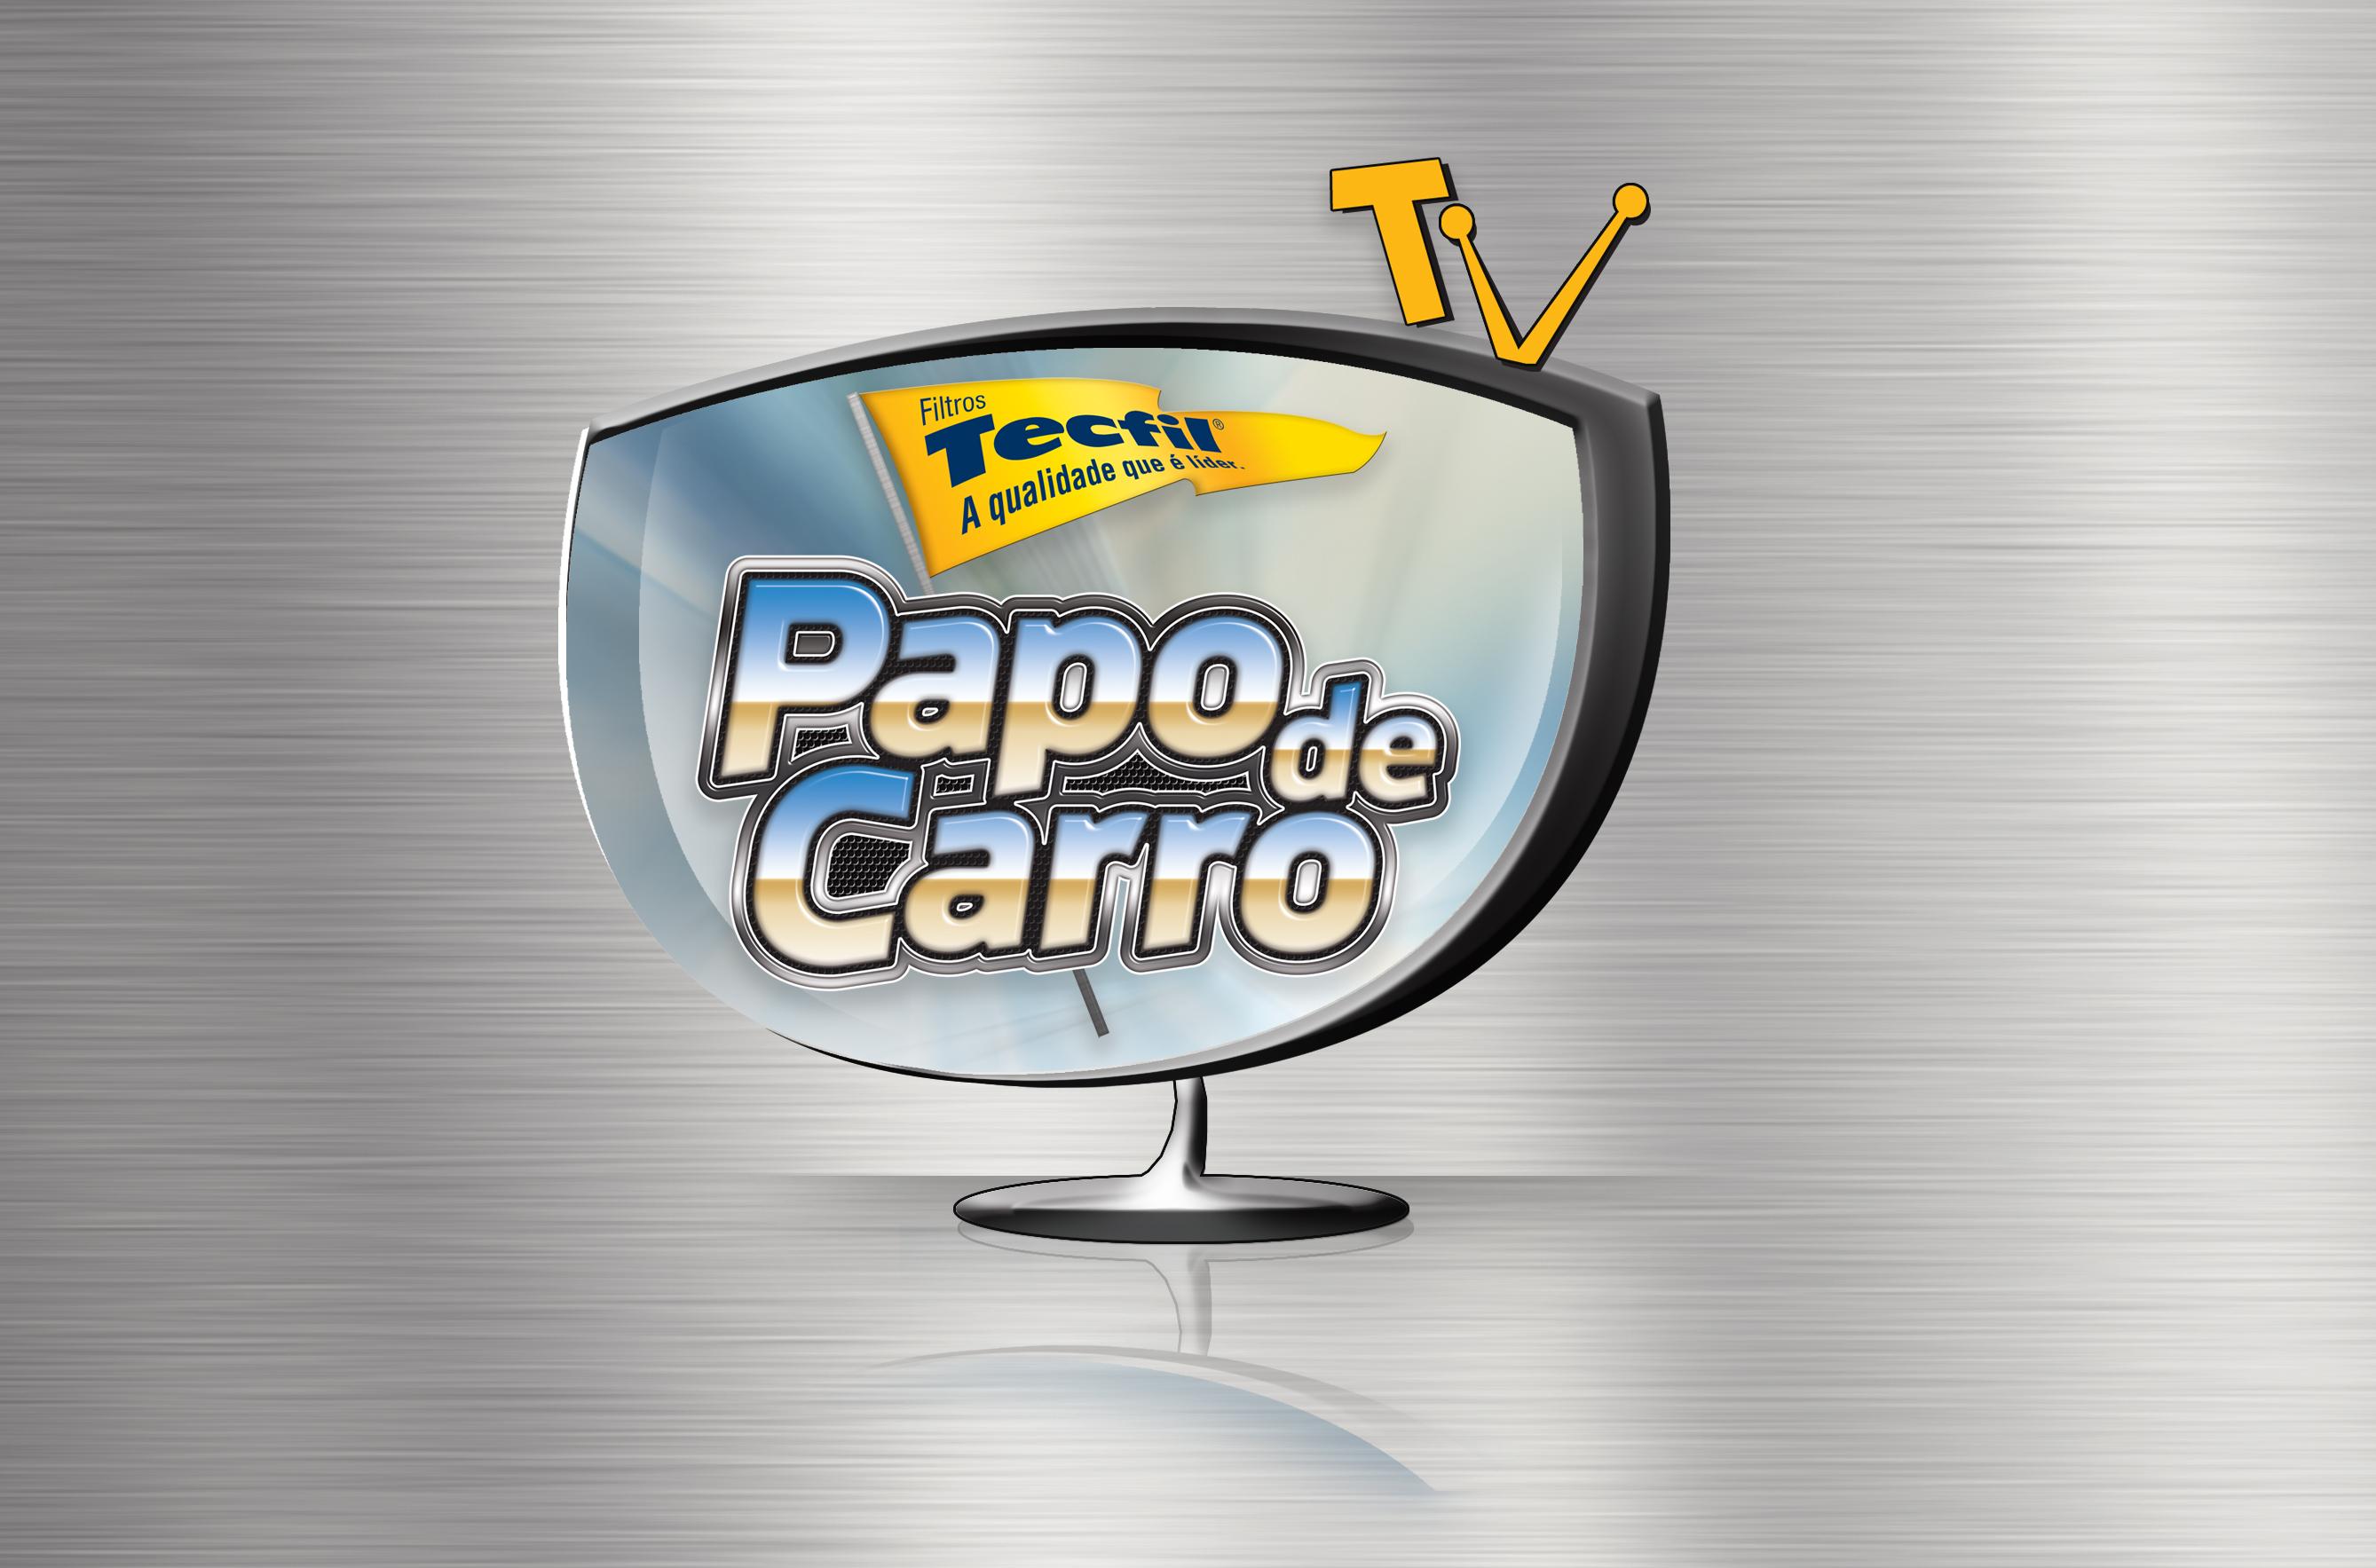 Logo papo de carro_TV.jpg